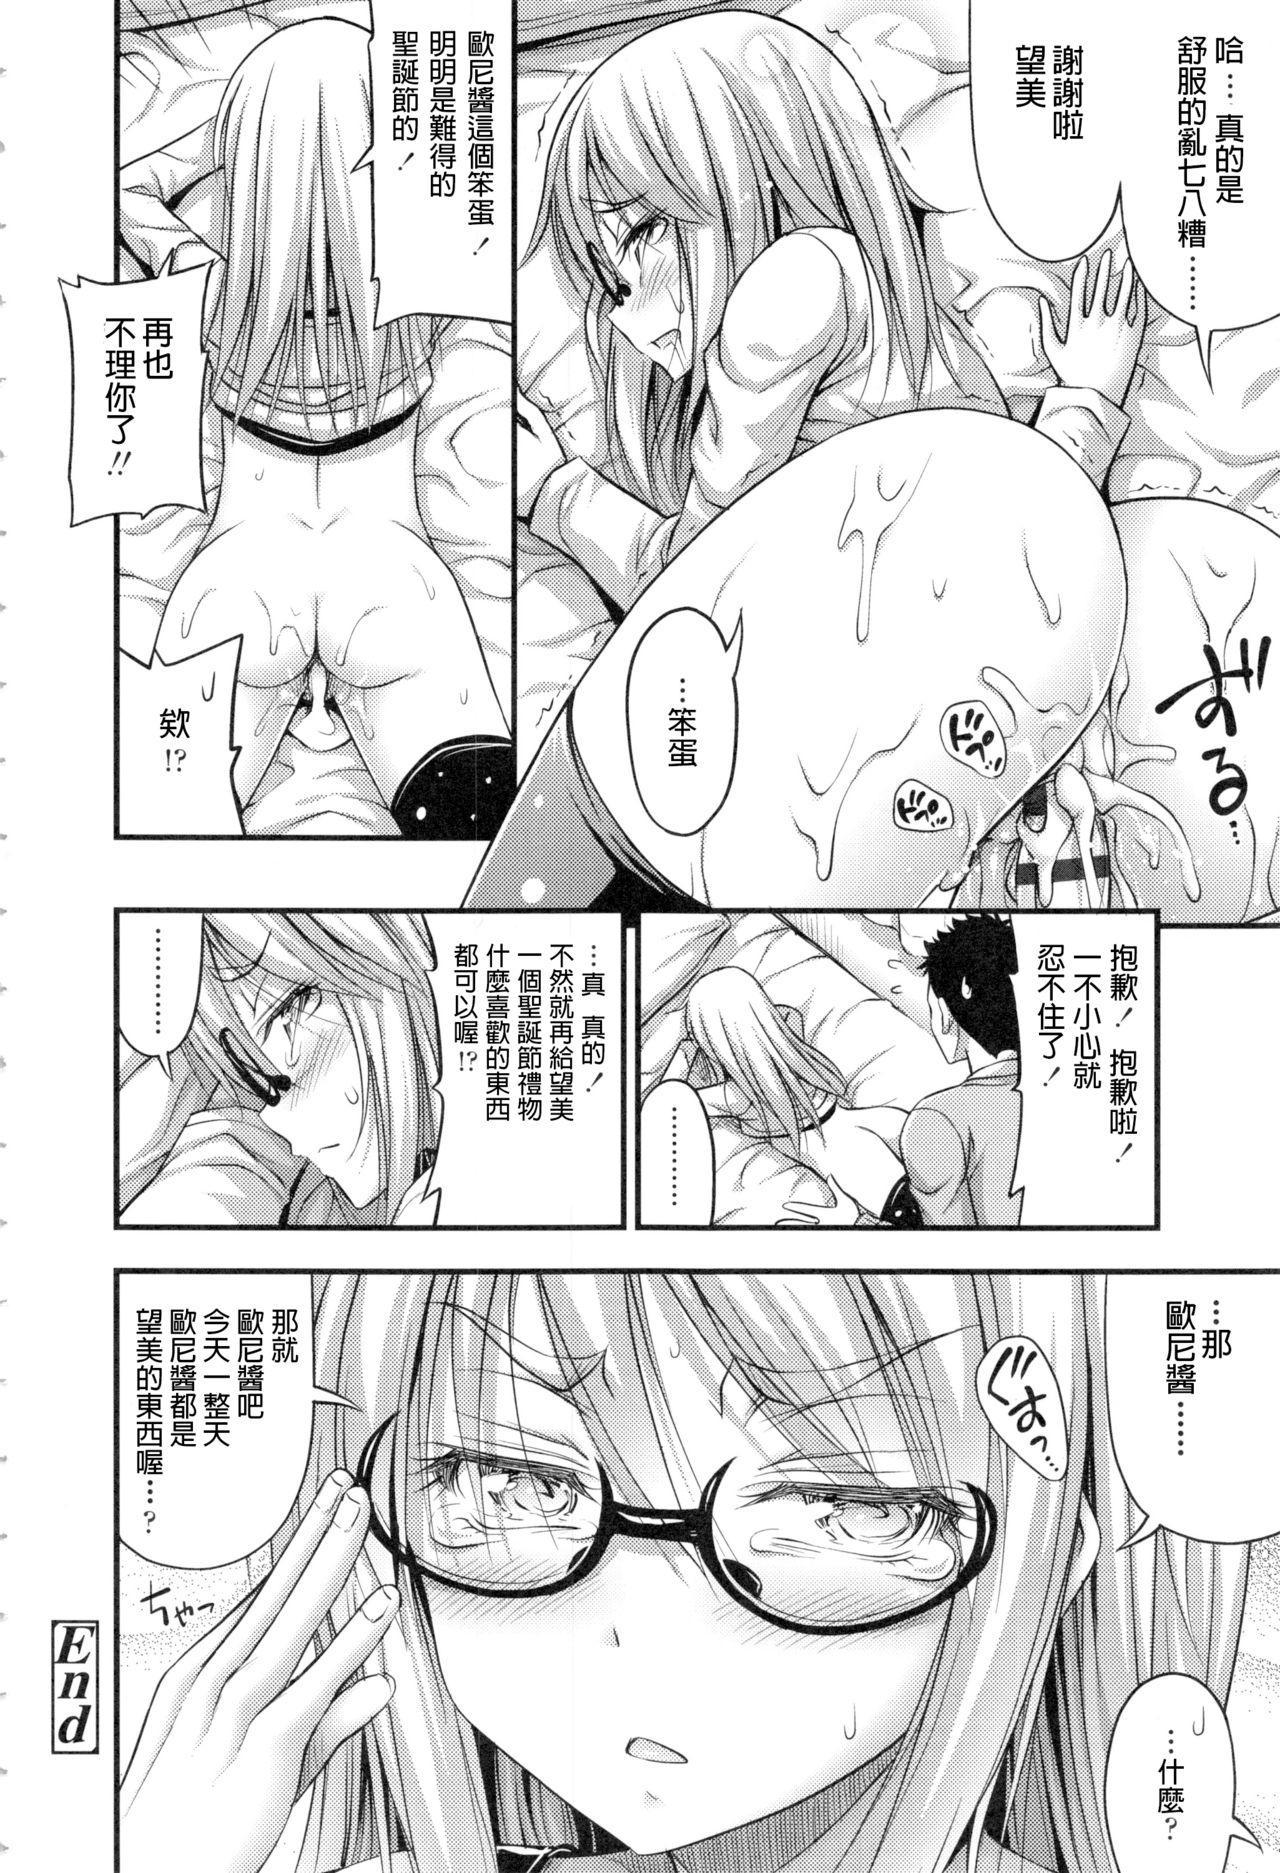 Onii-chan Sonna ni Short Pants Suki nano? 99